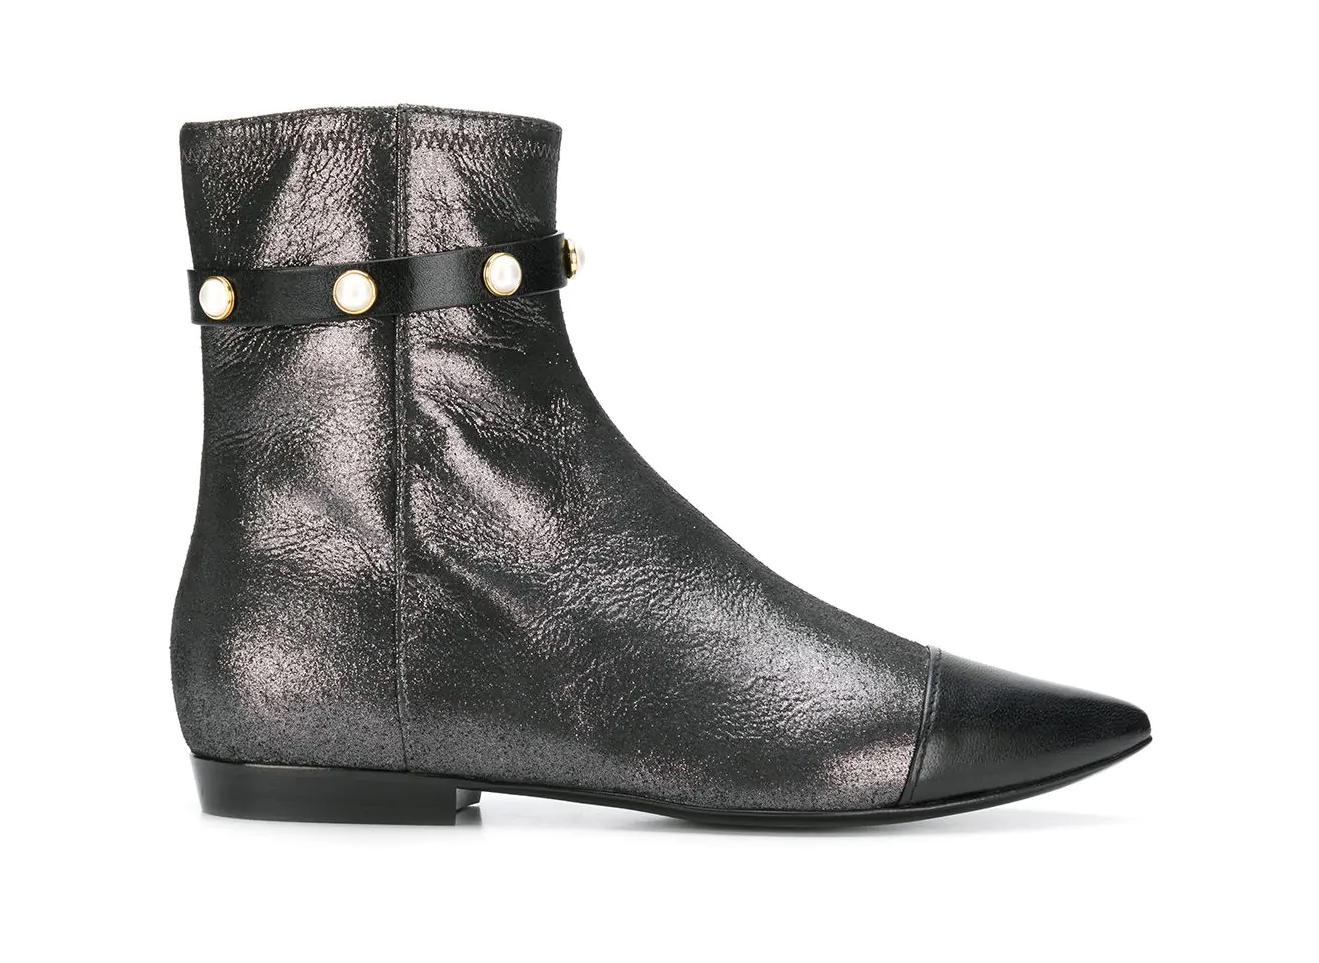 Philosophy di Lorenzo Serafini ankle boots